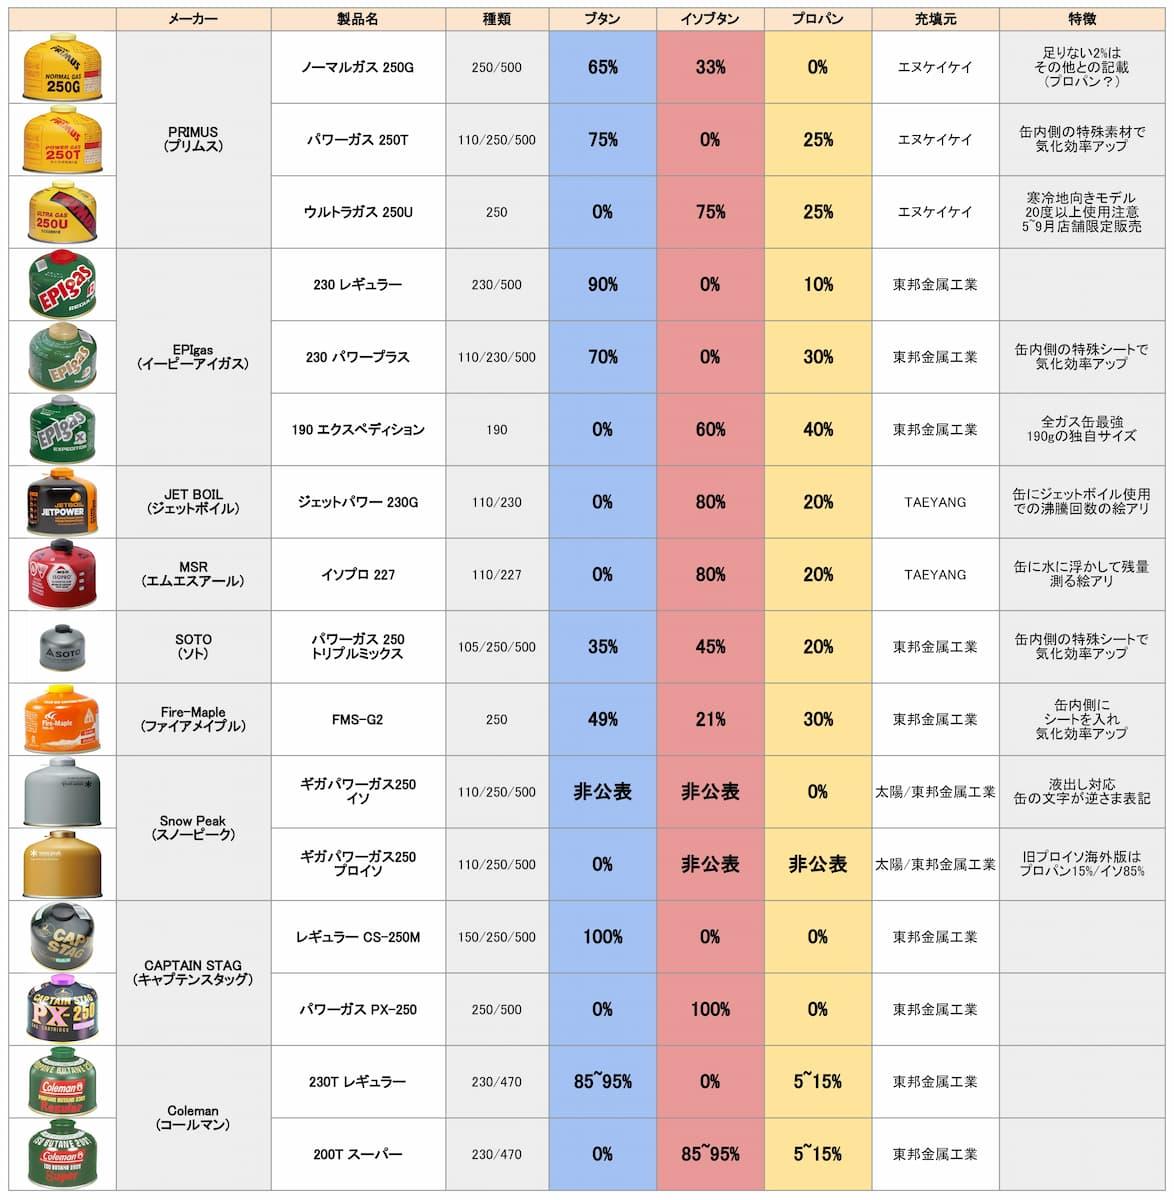 OD缶 ガス配分 各社比較表